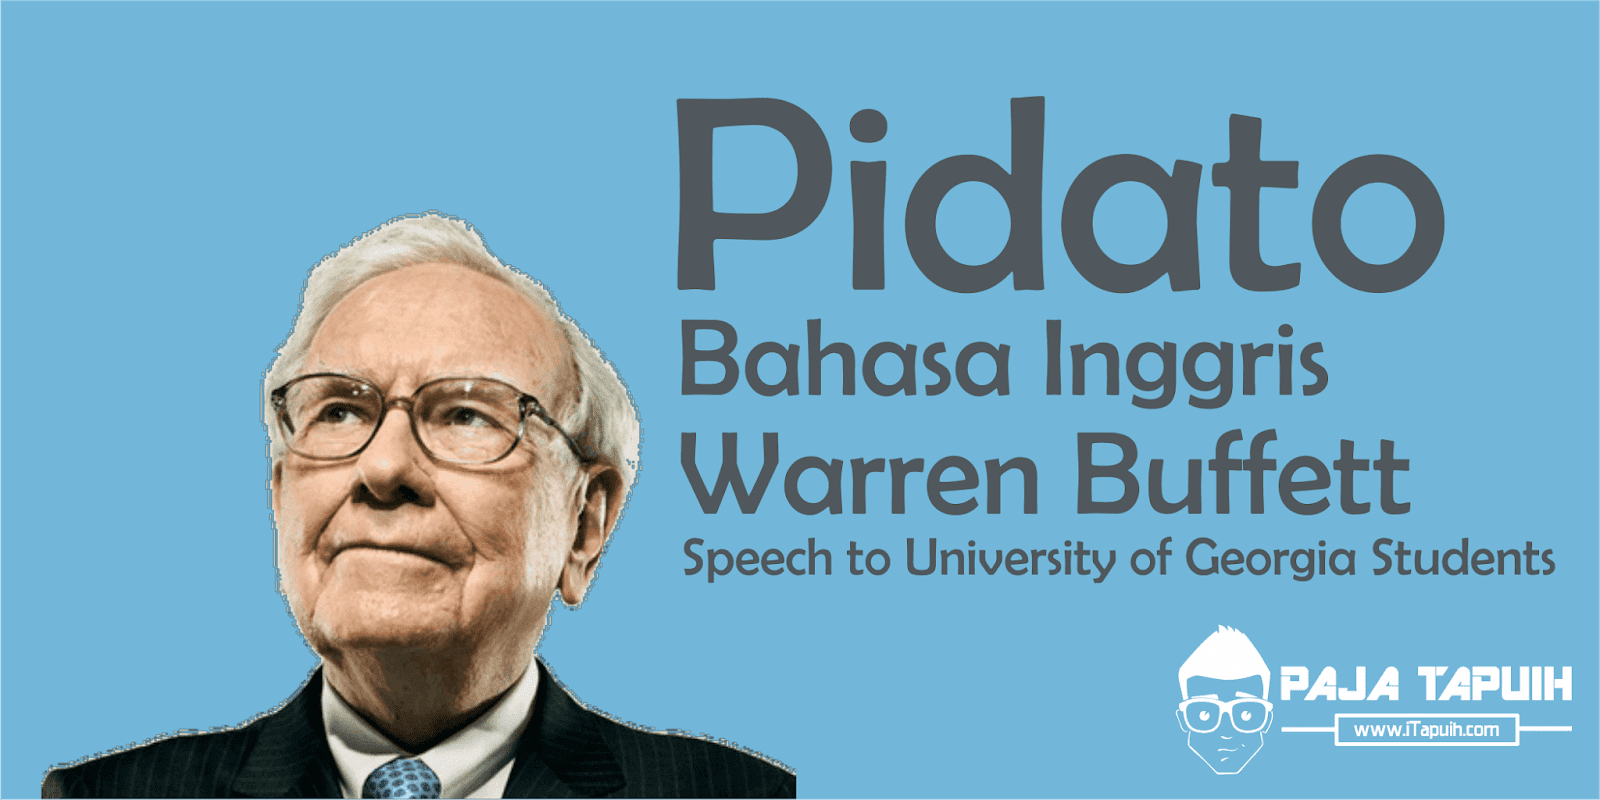 Pidato Bahasa Inggris Warren Buffett: Speech to University of Georgia Students dan Terjemahannya